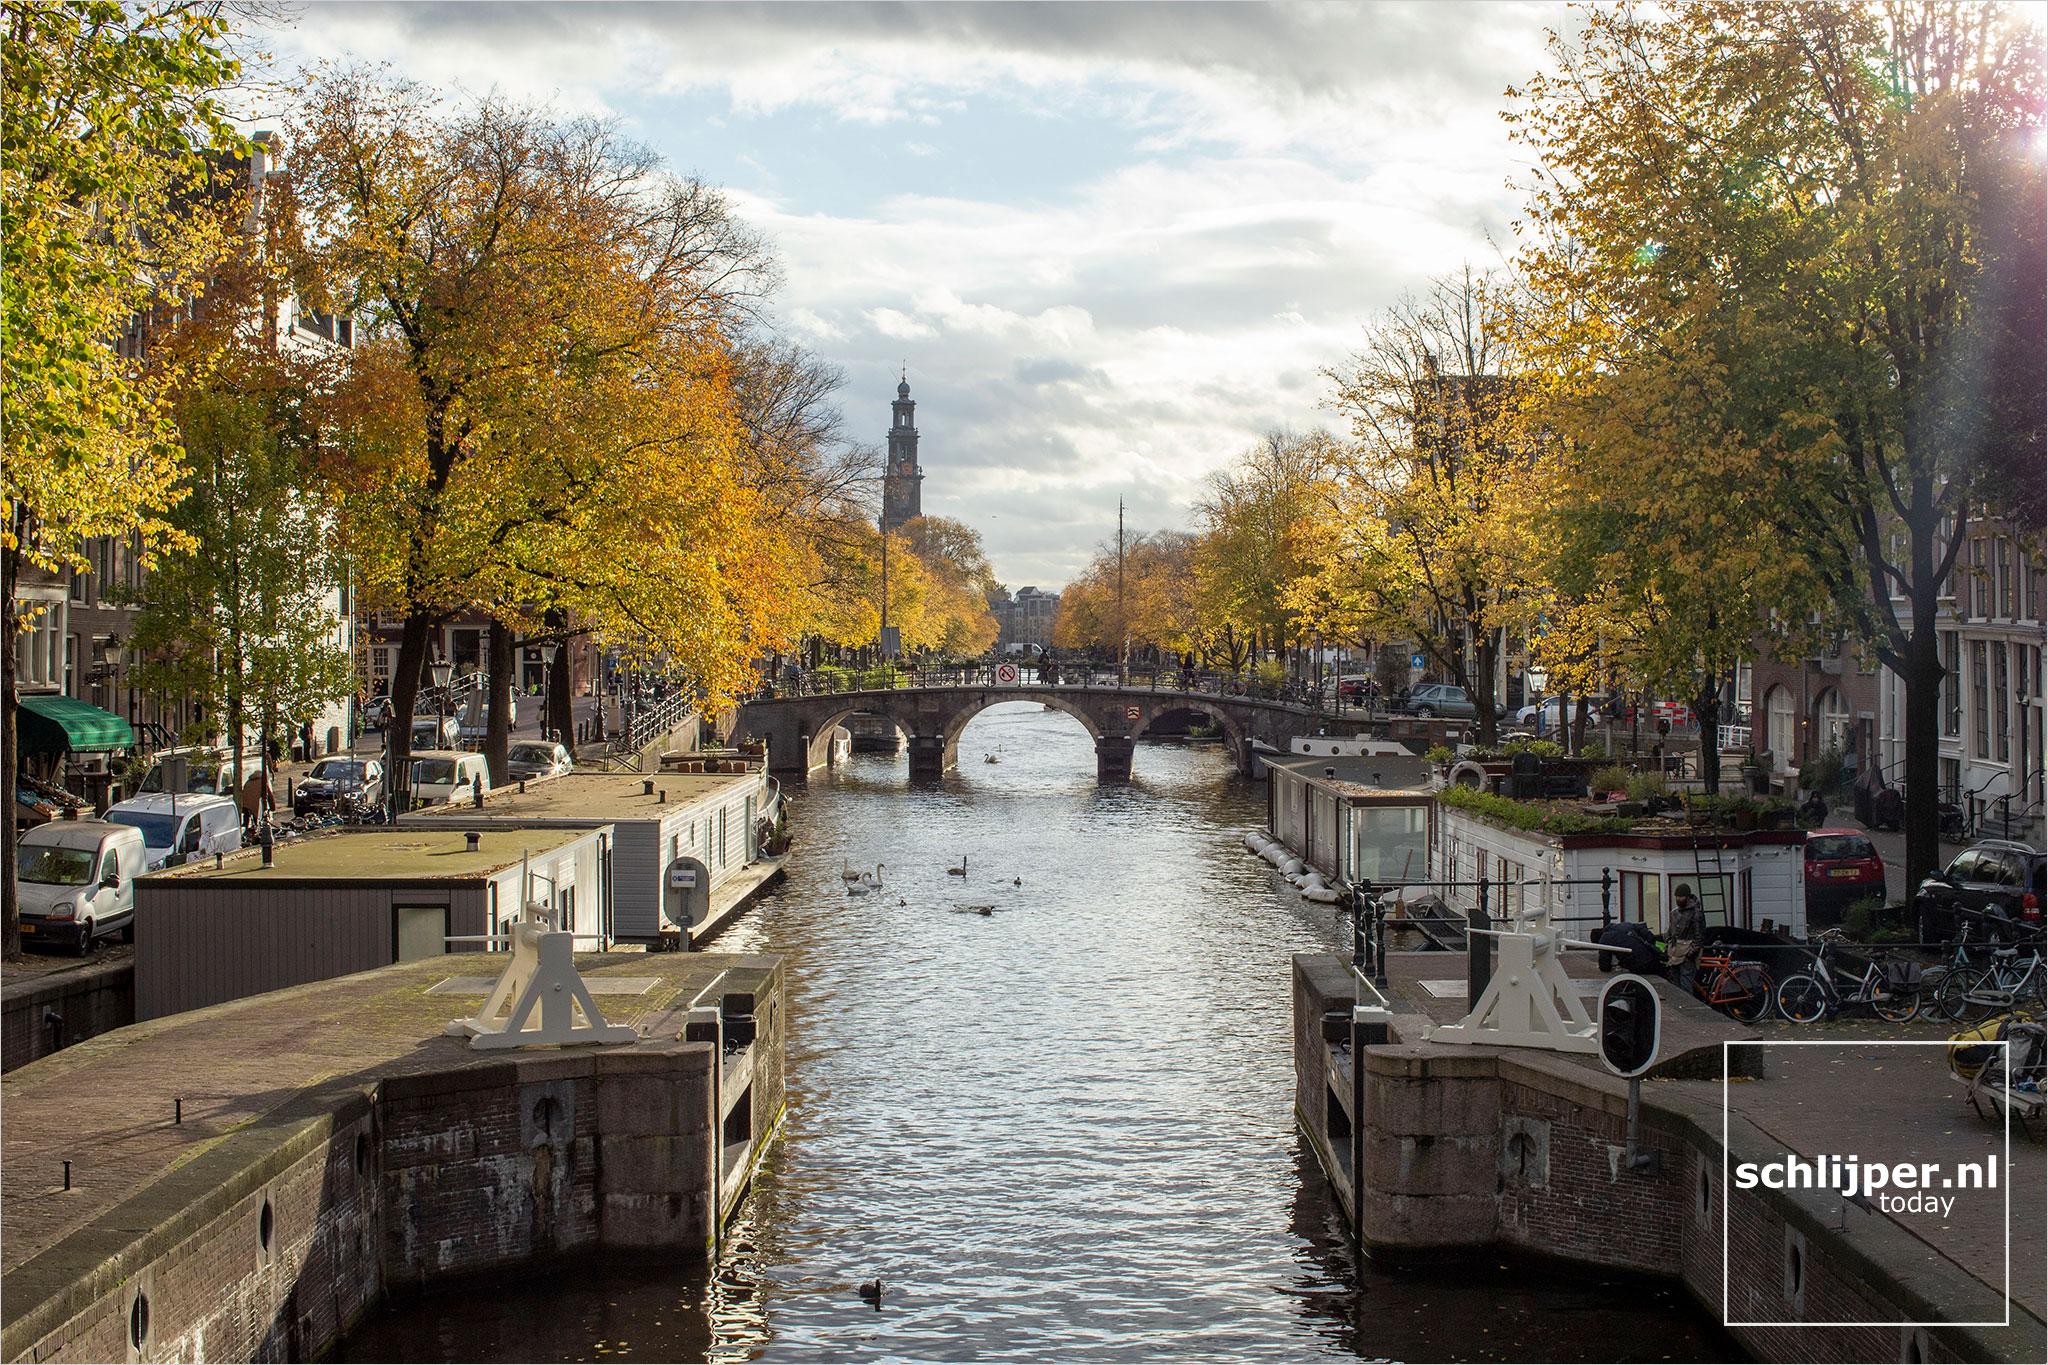 Nederland, Amsterdam, 16 oktober 2020